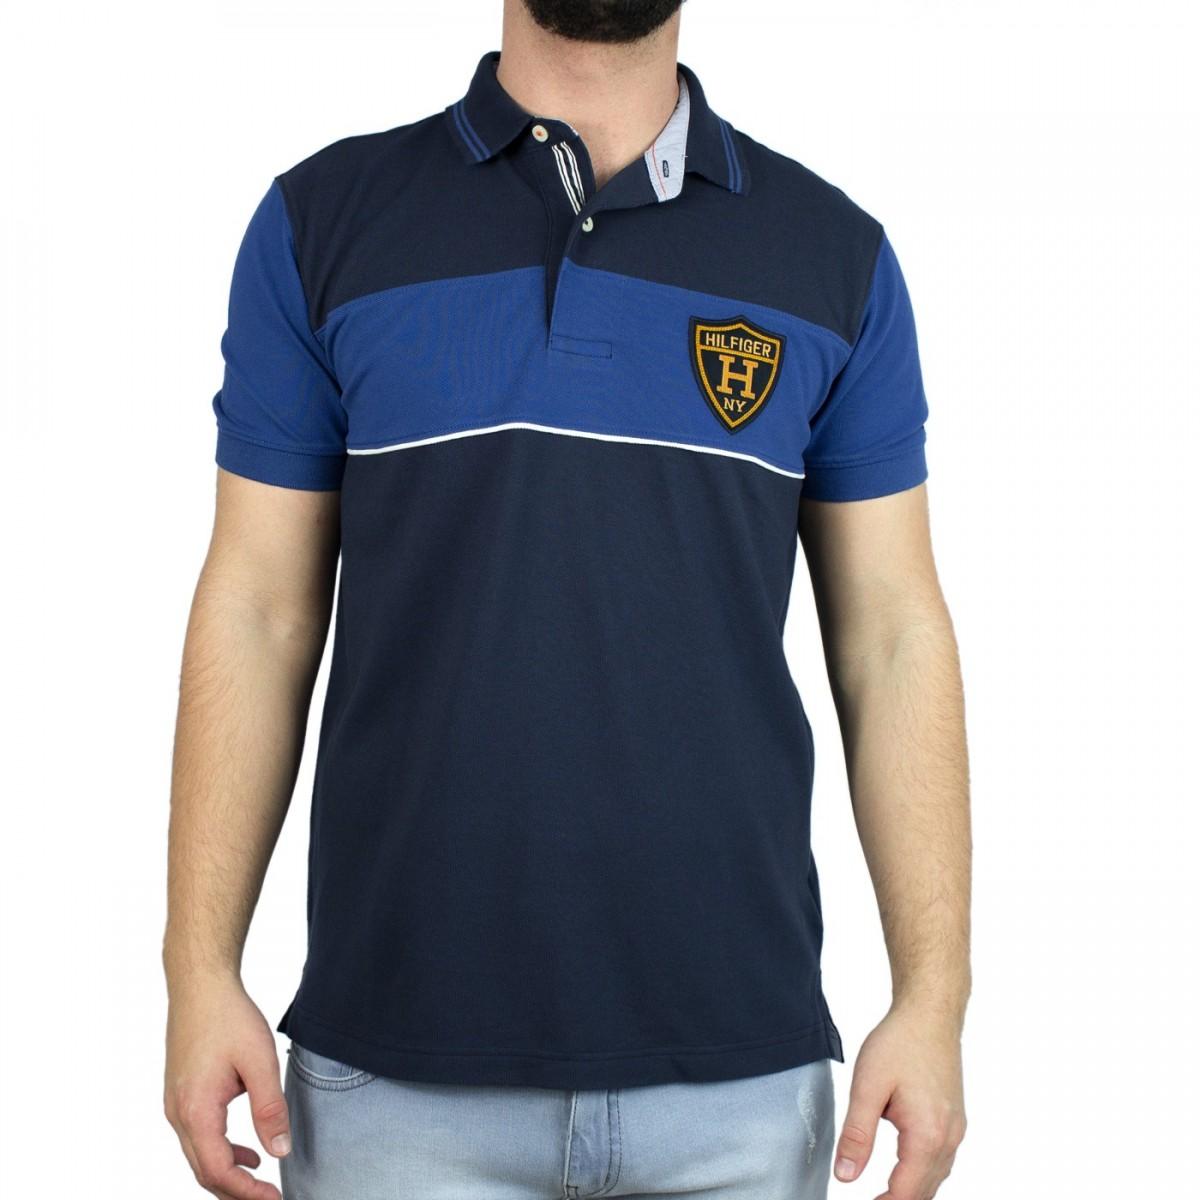 b8ee94b836bd8 Bizz Store - Camisa Polo Masculina Tommy Hilfiger Estampada